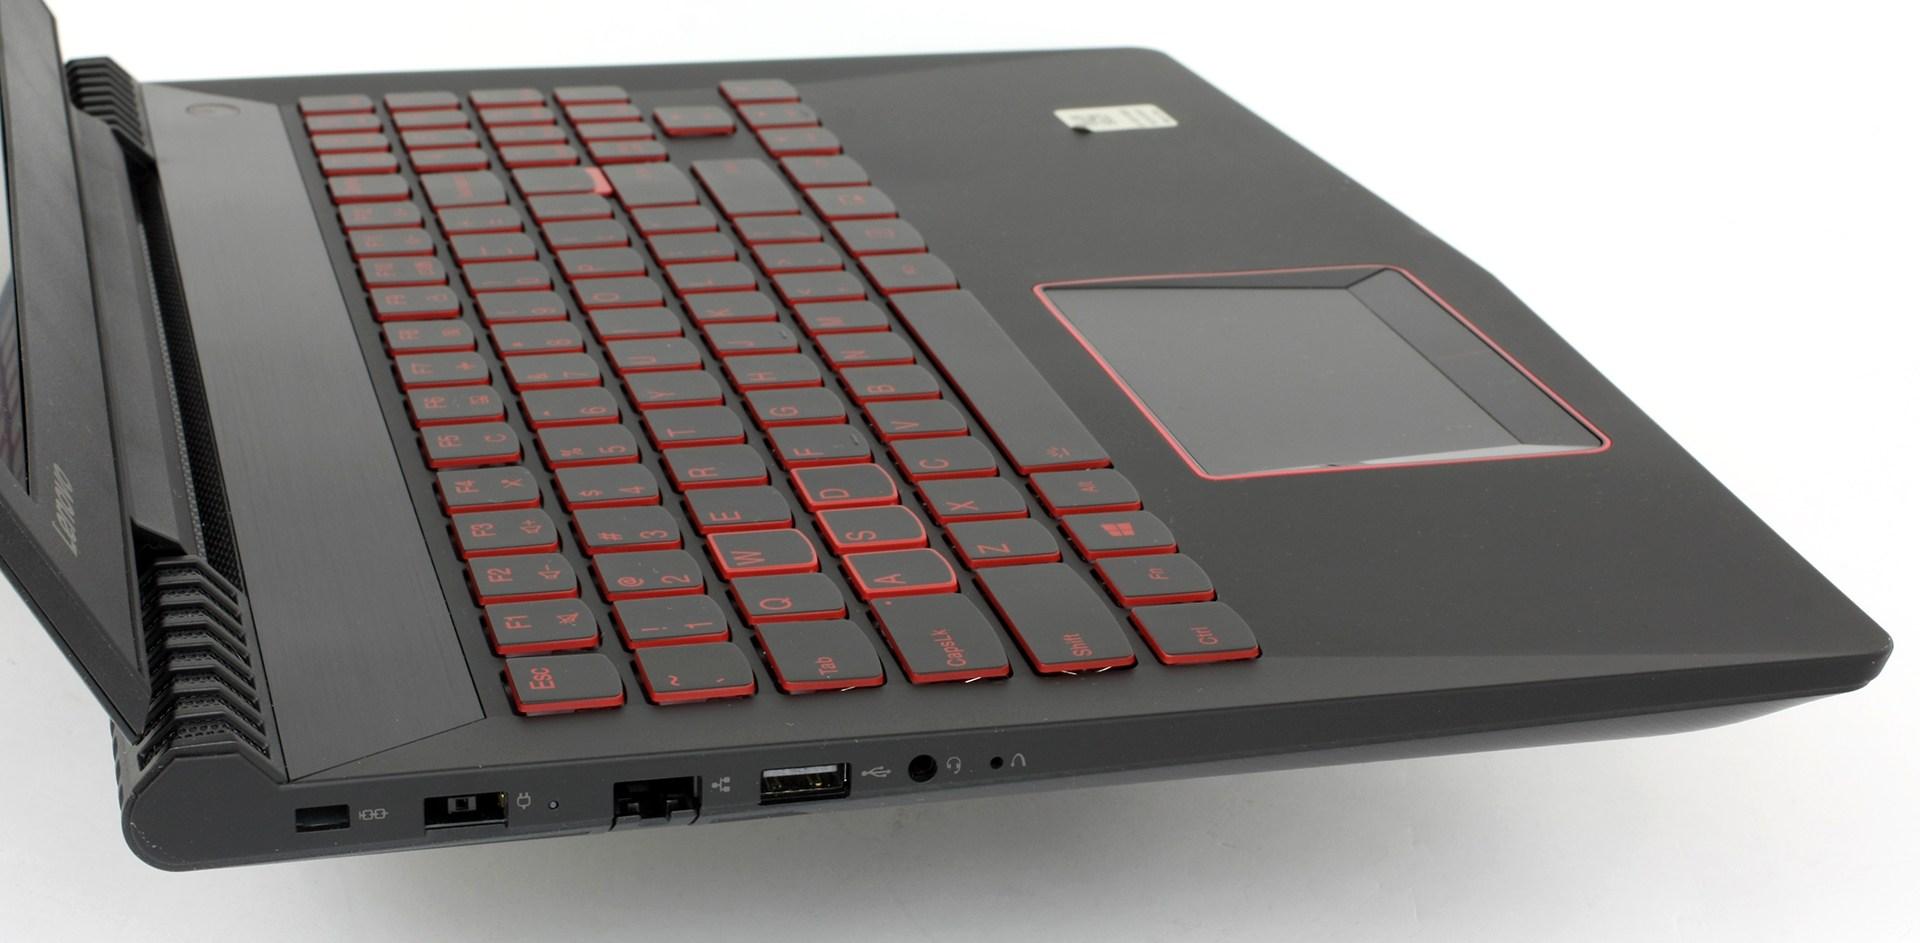 review Lenovo Legion Y520 (GTX 1050 Ti) 600 09